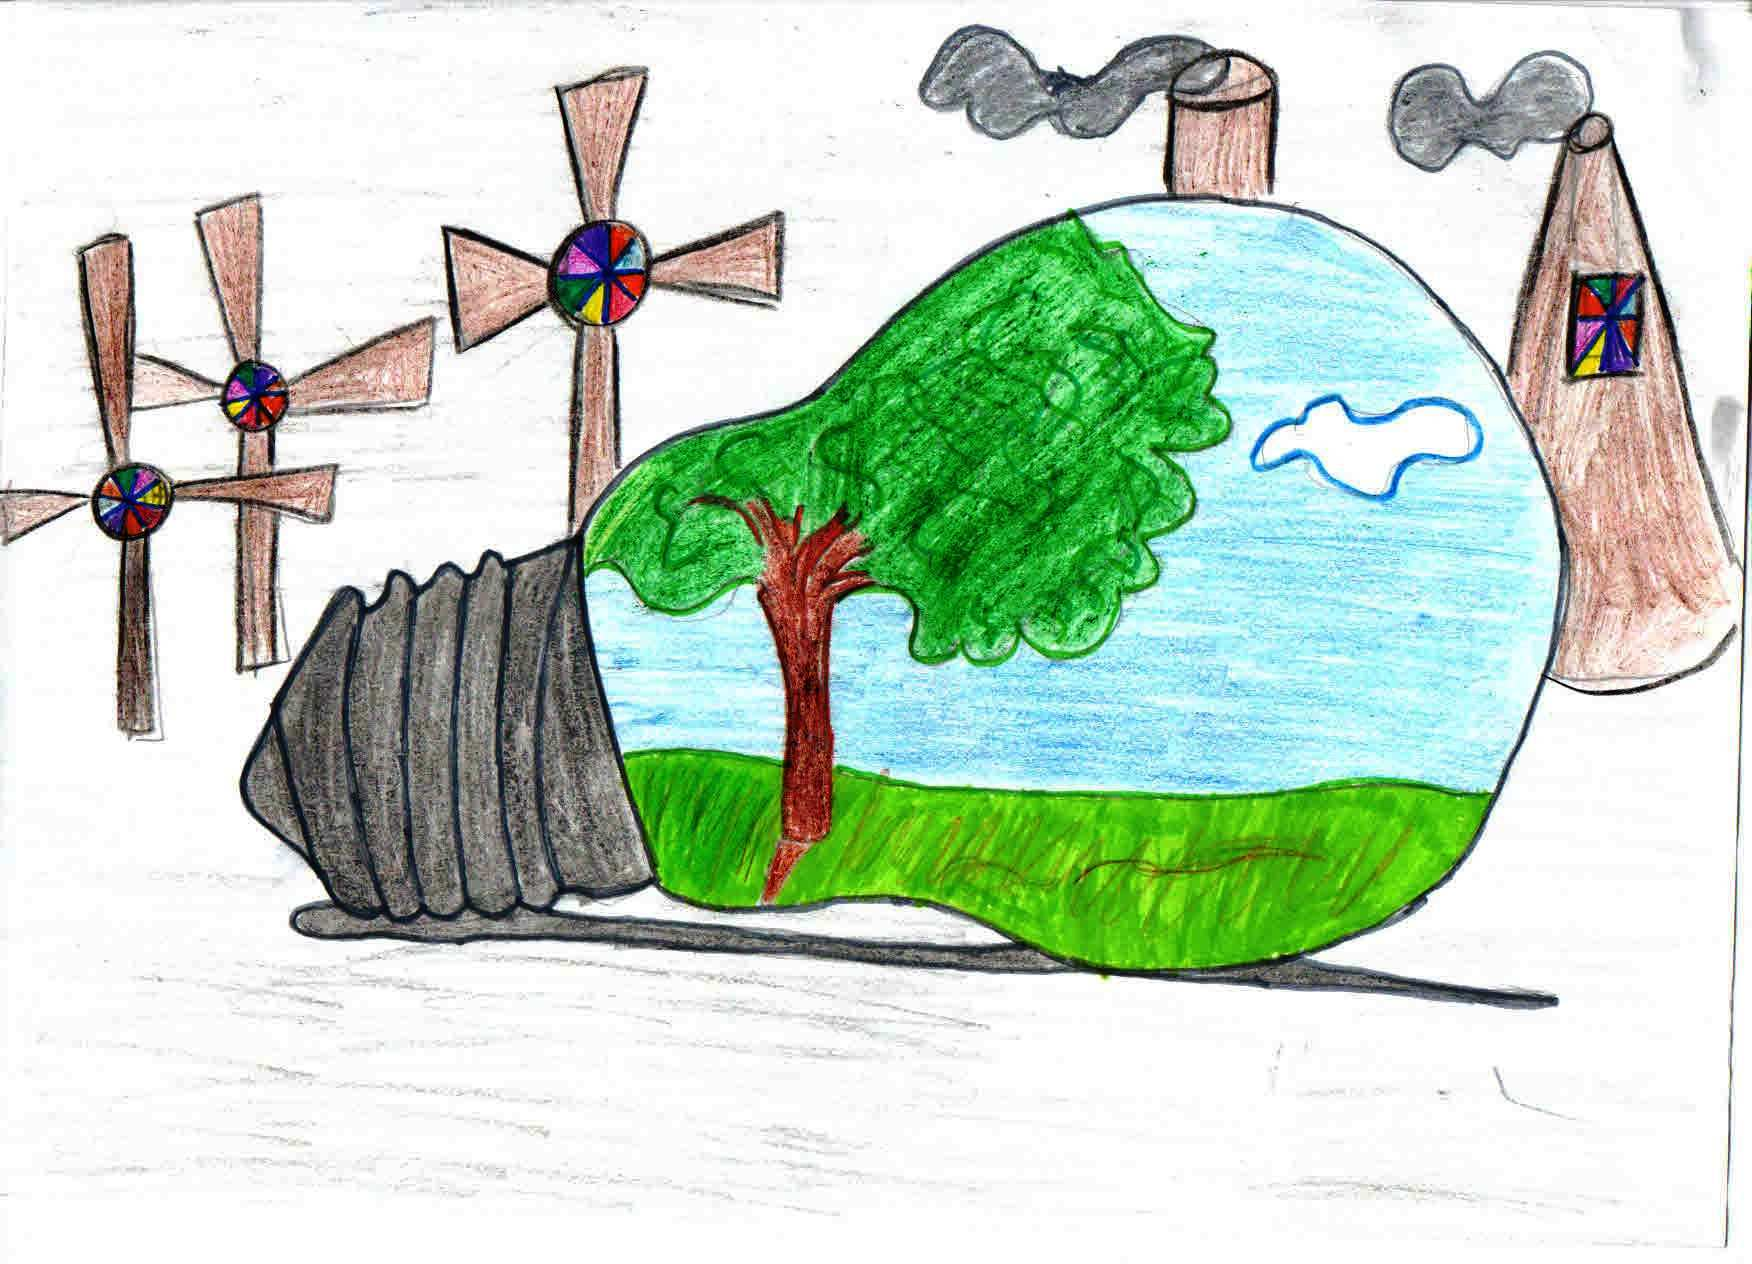 Конкурс рисунков на тему охрана окружающей среды